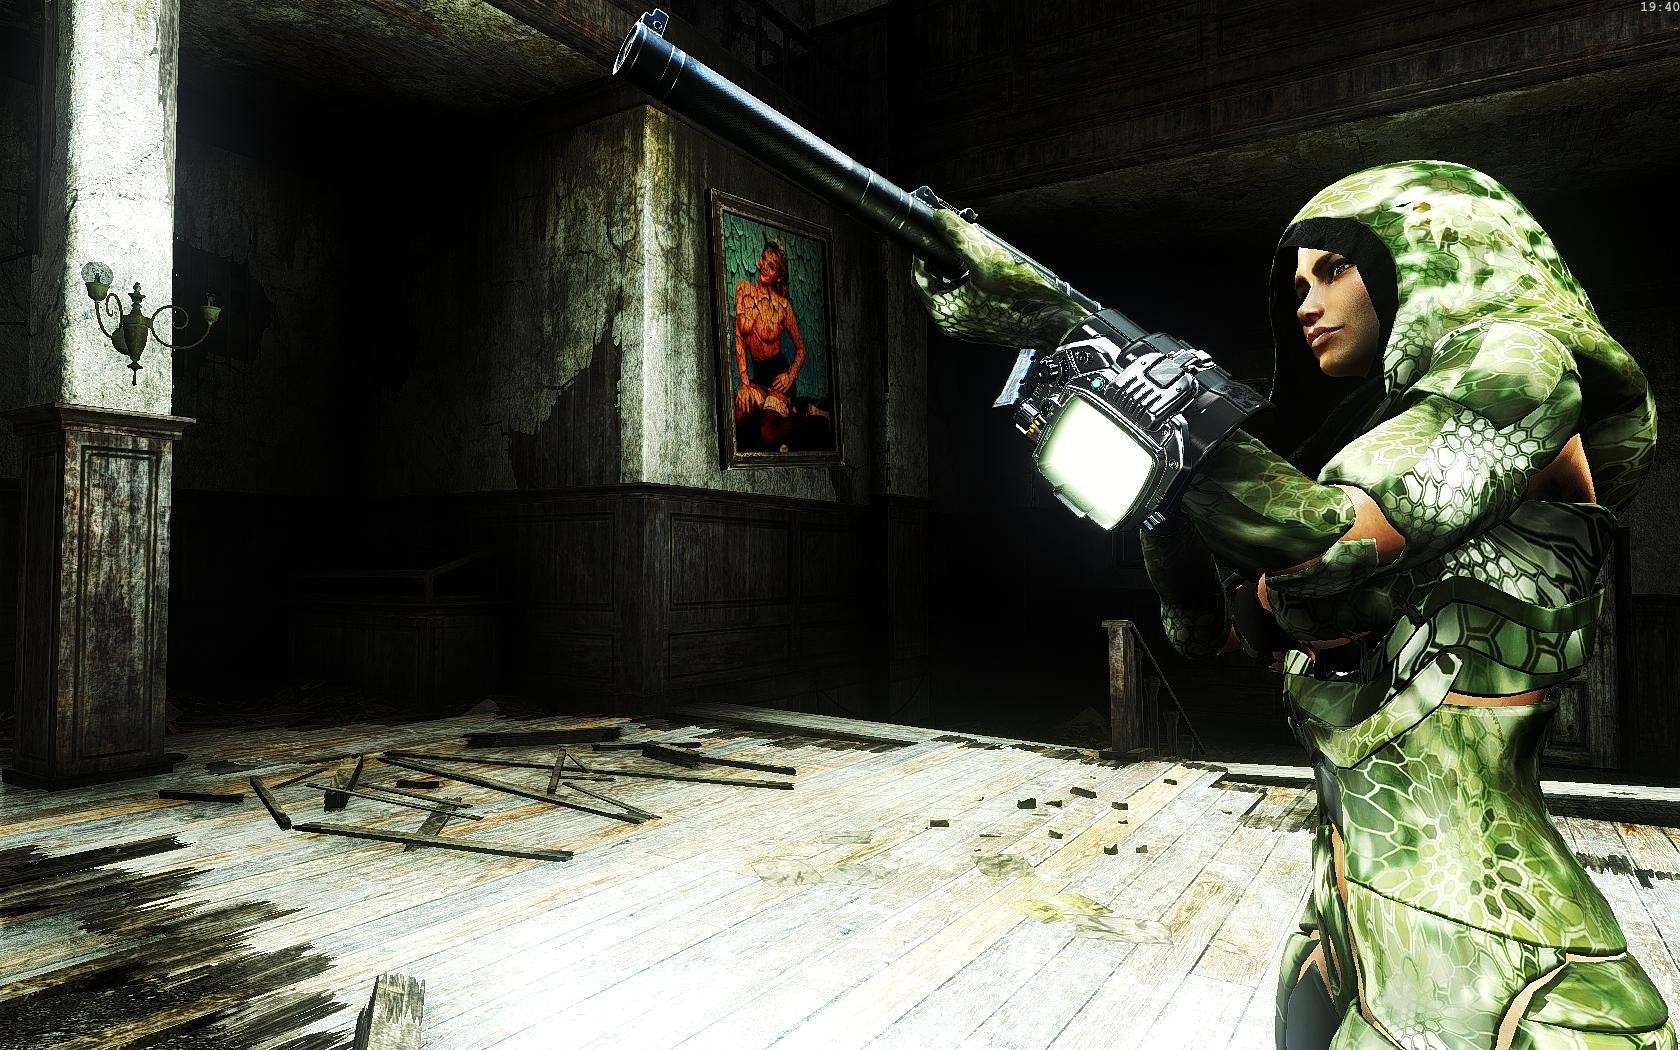 Fallout4 2019-01-15 19-40-44-91